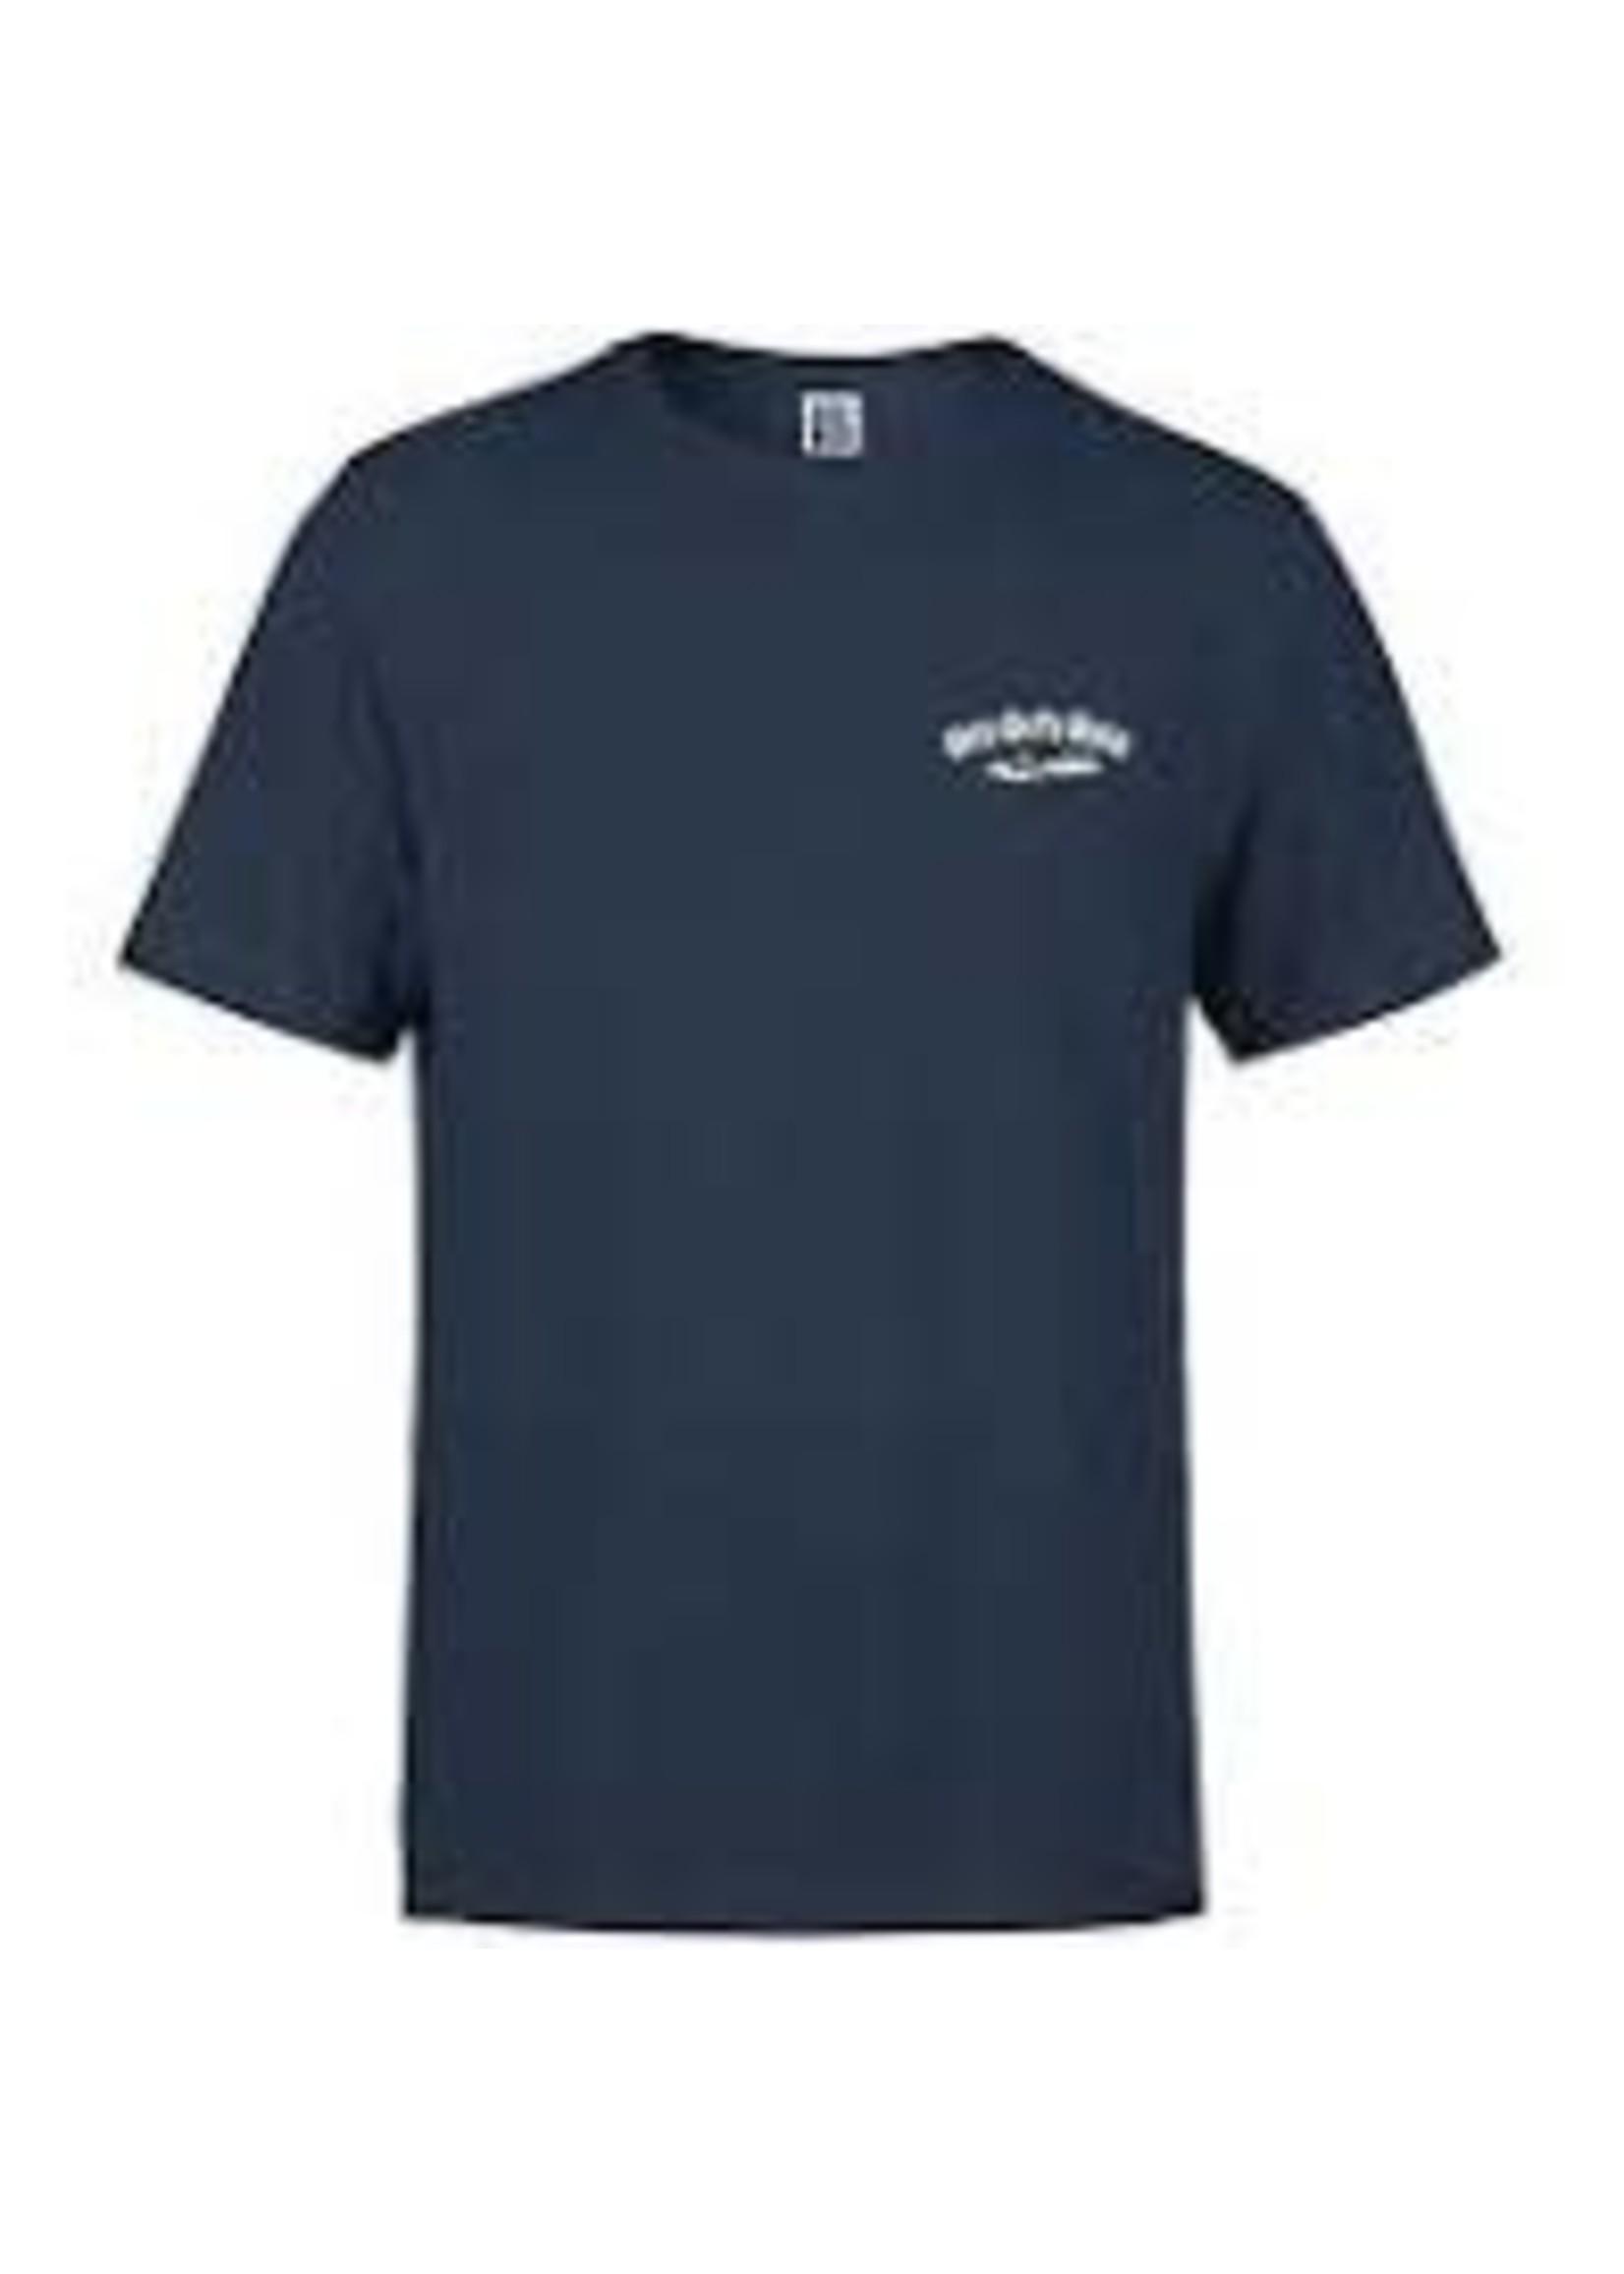 Old Guys Rule Old Guys Rule T-Shirt - Bucket List